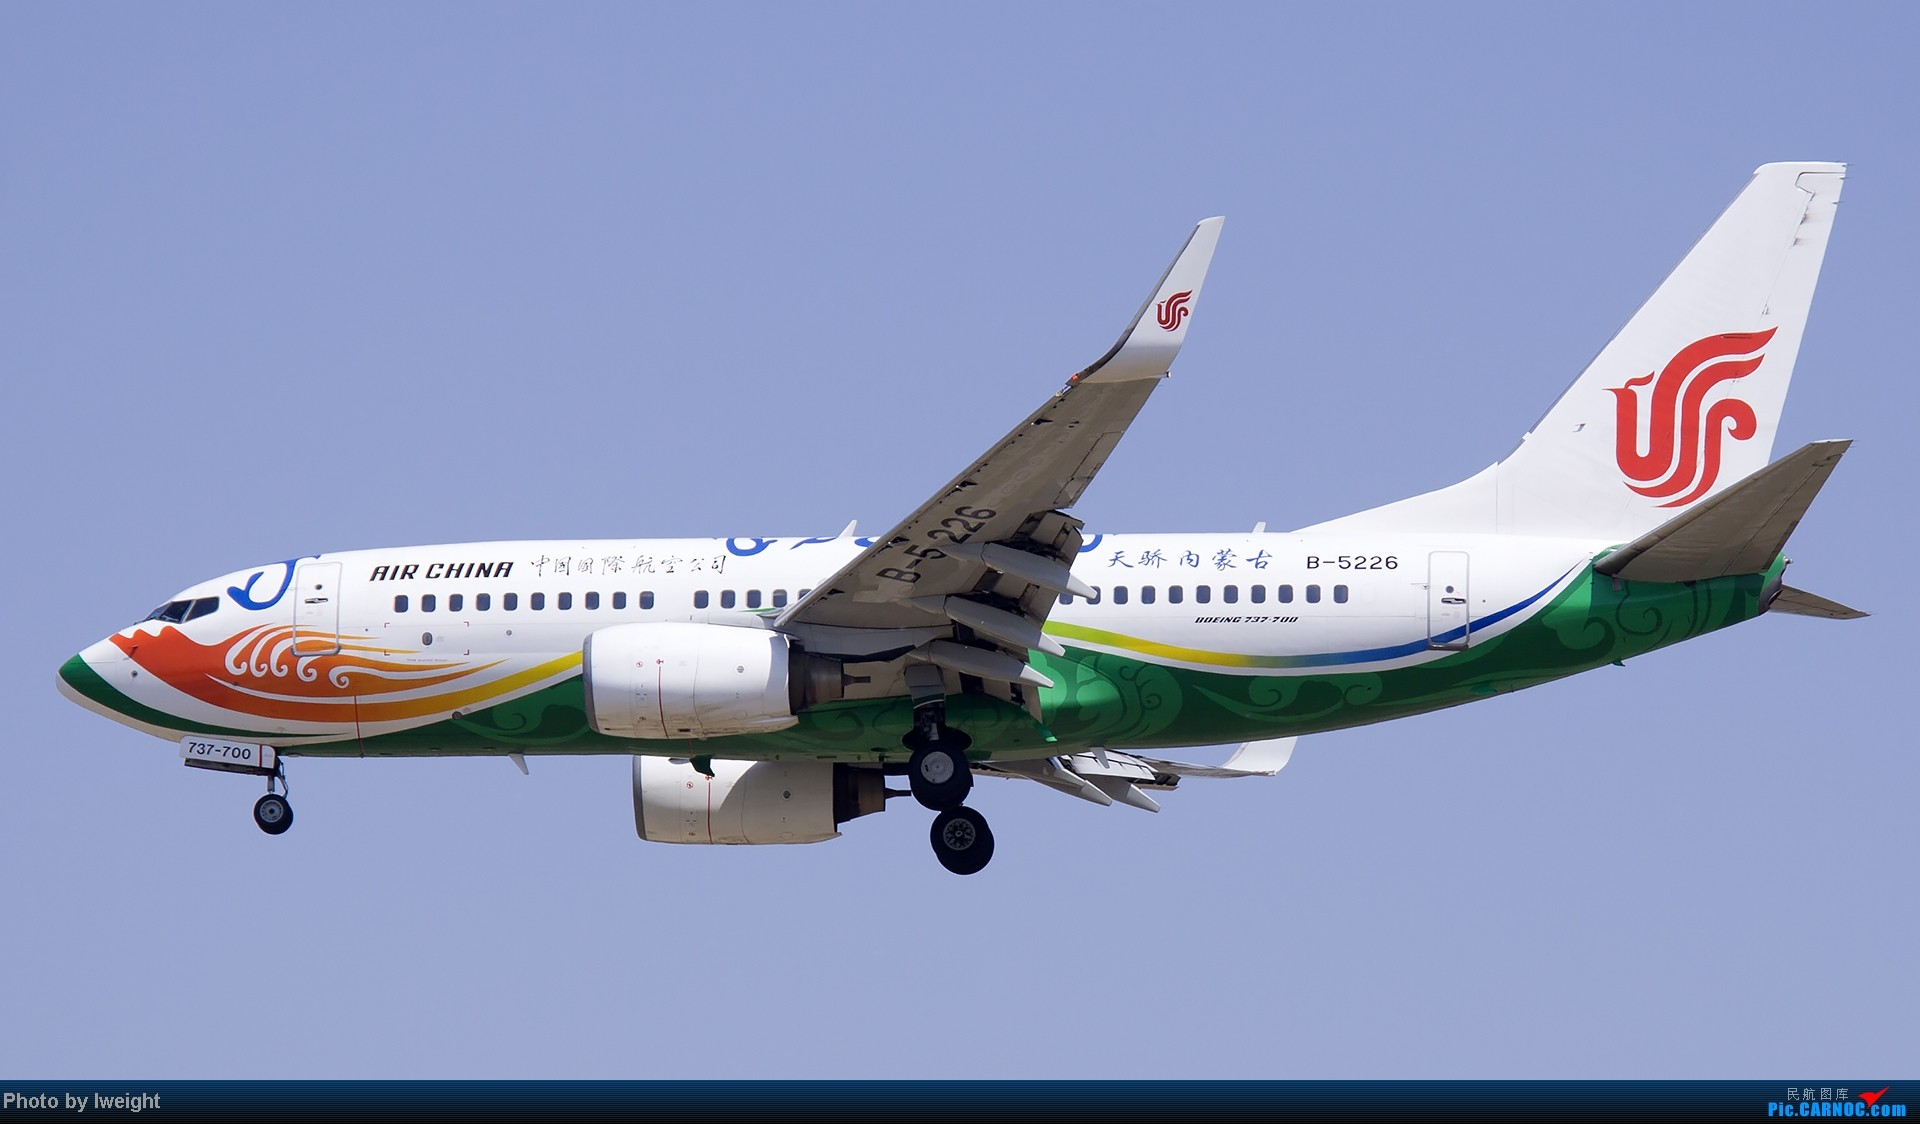 Re:[原创]北京难得的好天气,收获多种机型和彩绘,遗憾的是再次错过卡航巴塞罗那彩绘 BOEING 737-700 B-5226 中国北京首都机场